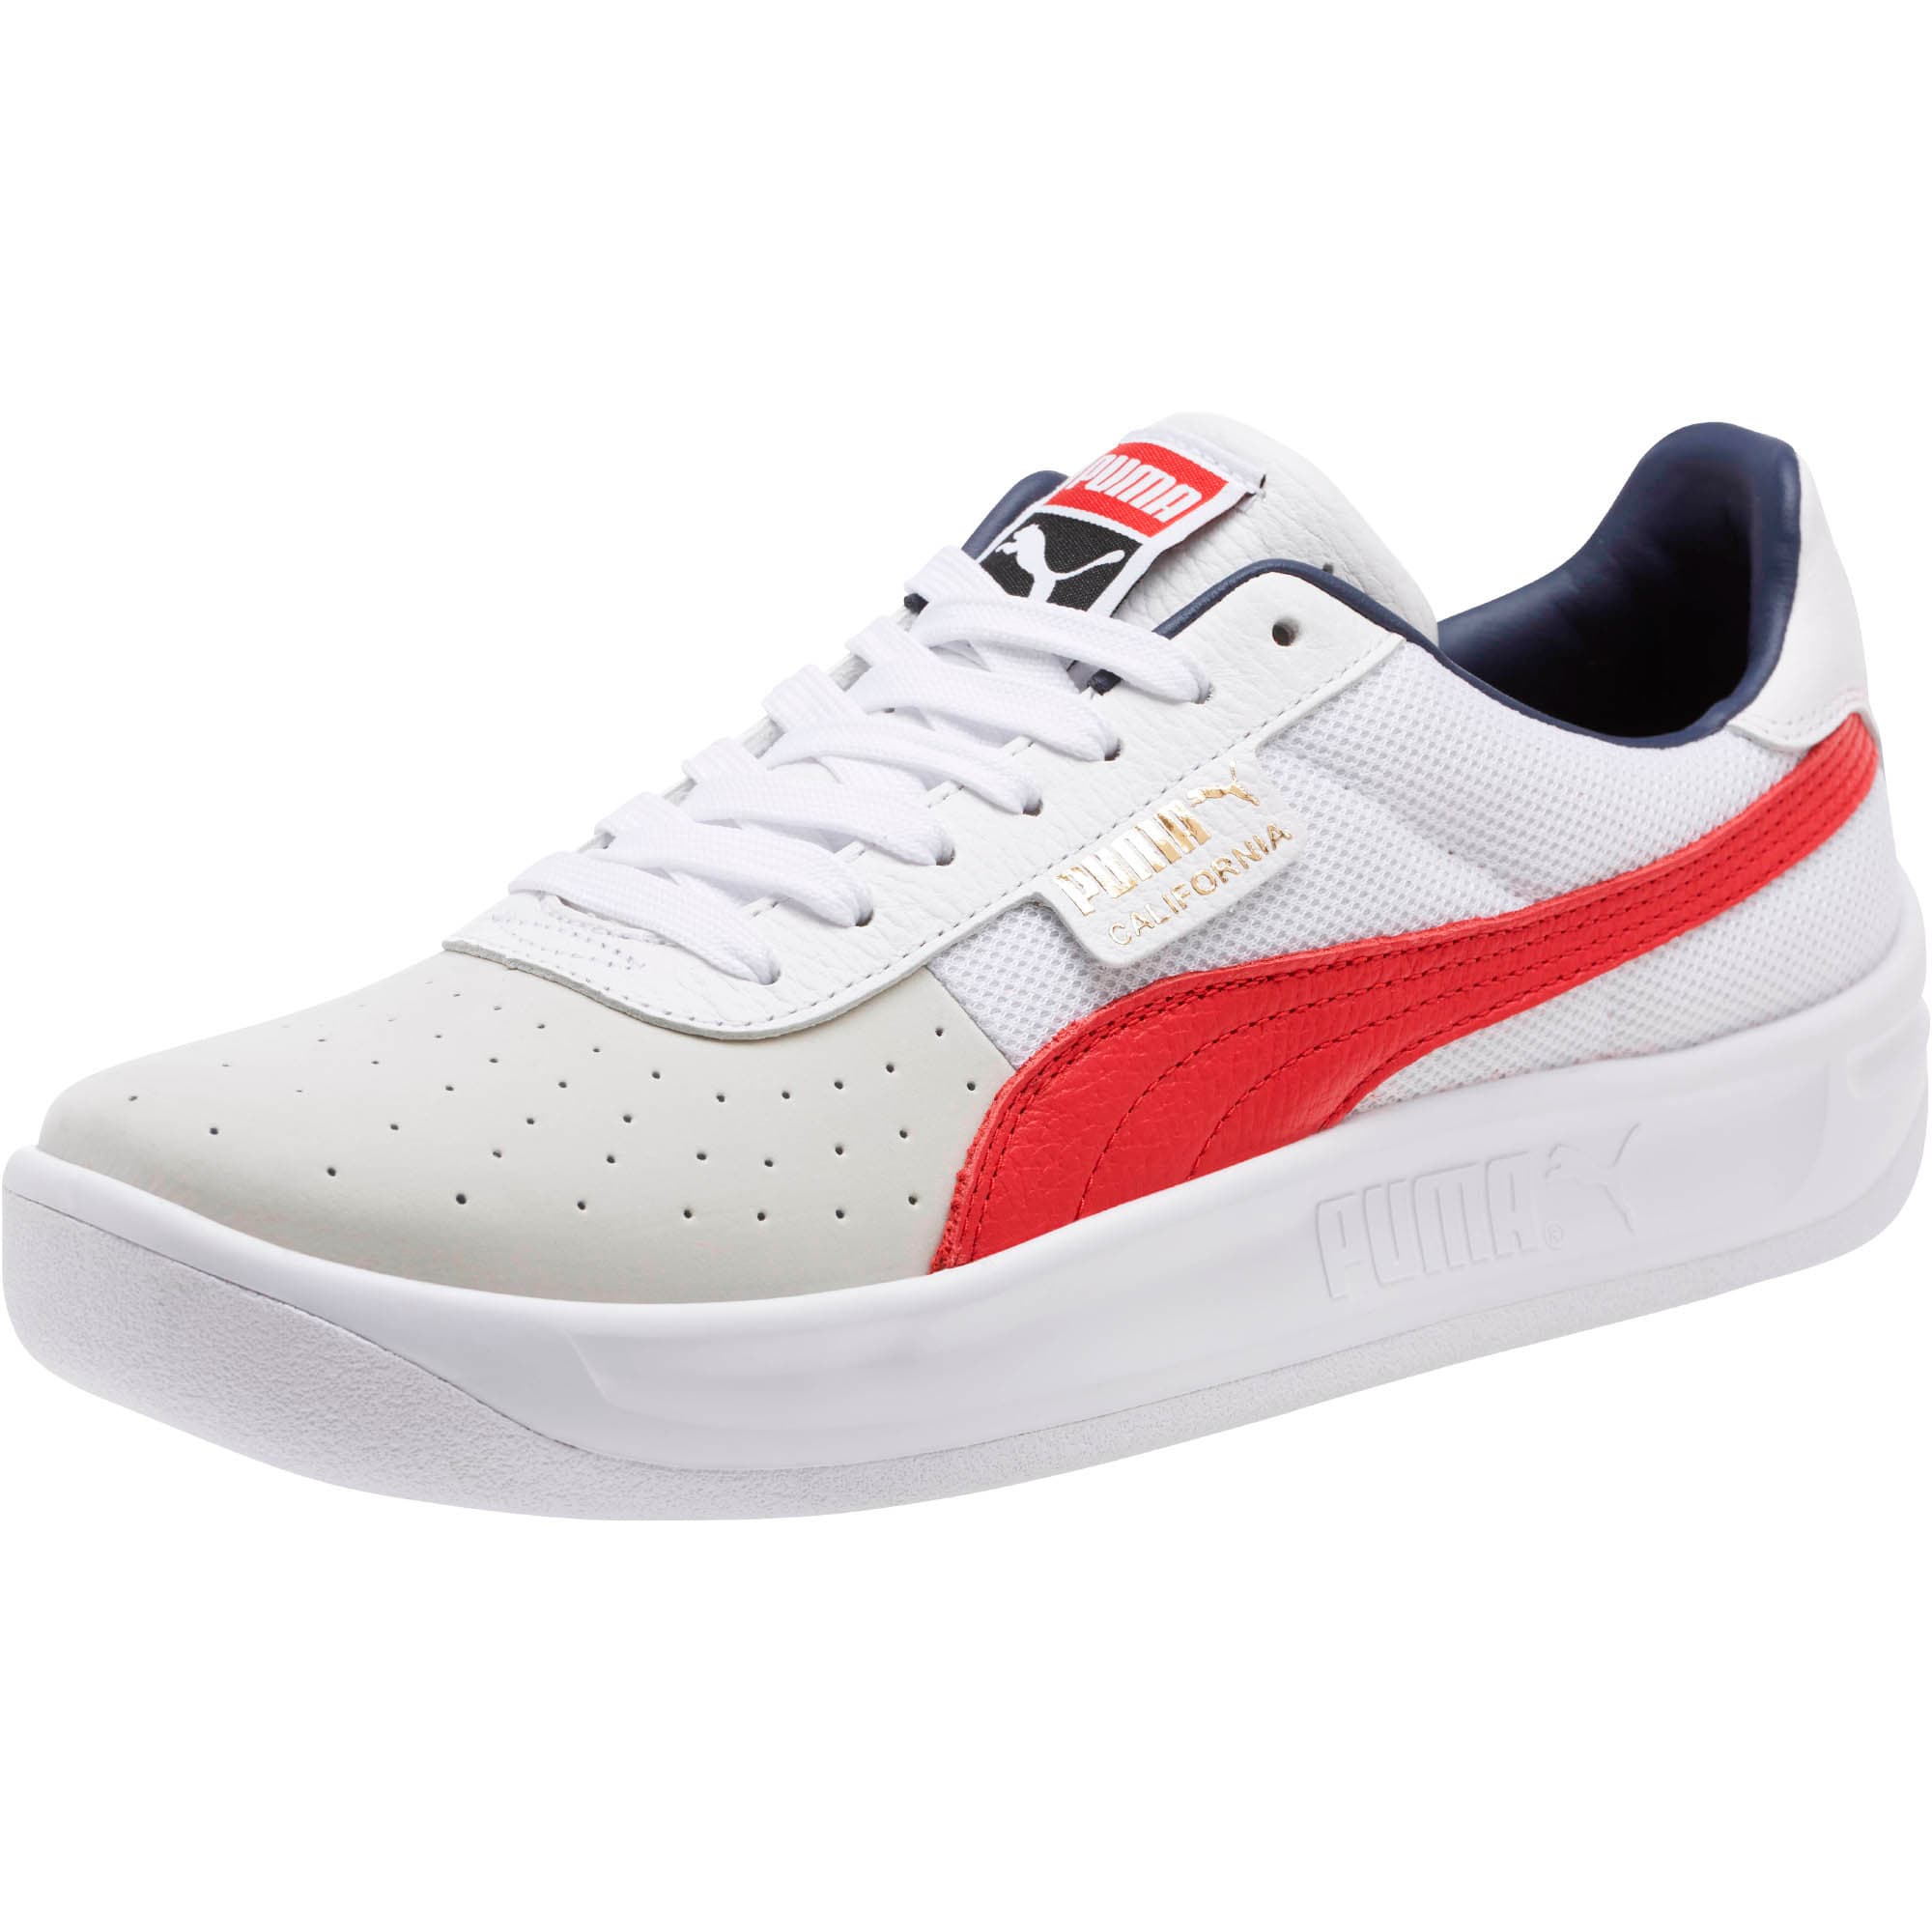 Thumbnail 1 of California Casual Sneakers, P White-RibbonRed-P White, medium